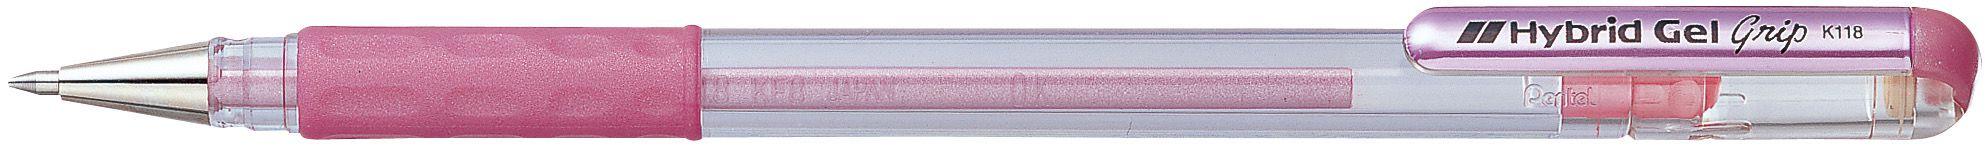 Caneta Hybrid Gel Grip Metallic Rosa K118-Mp